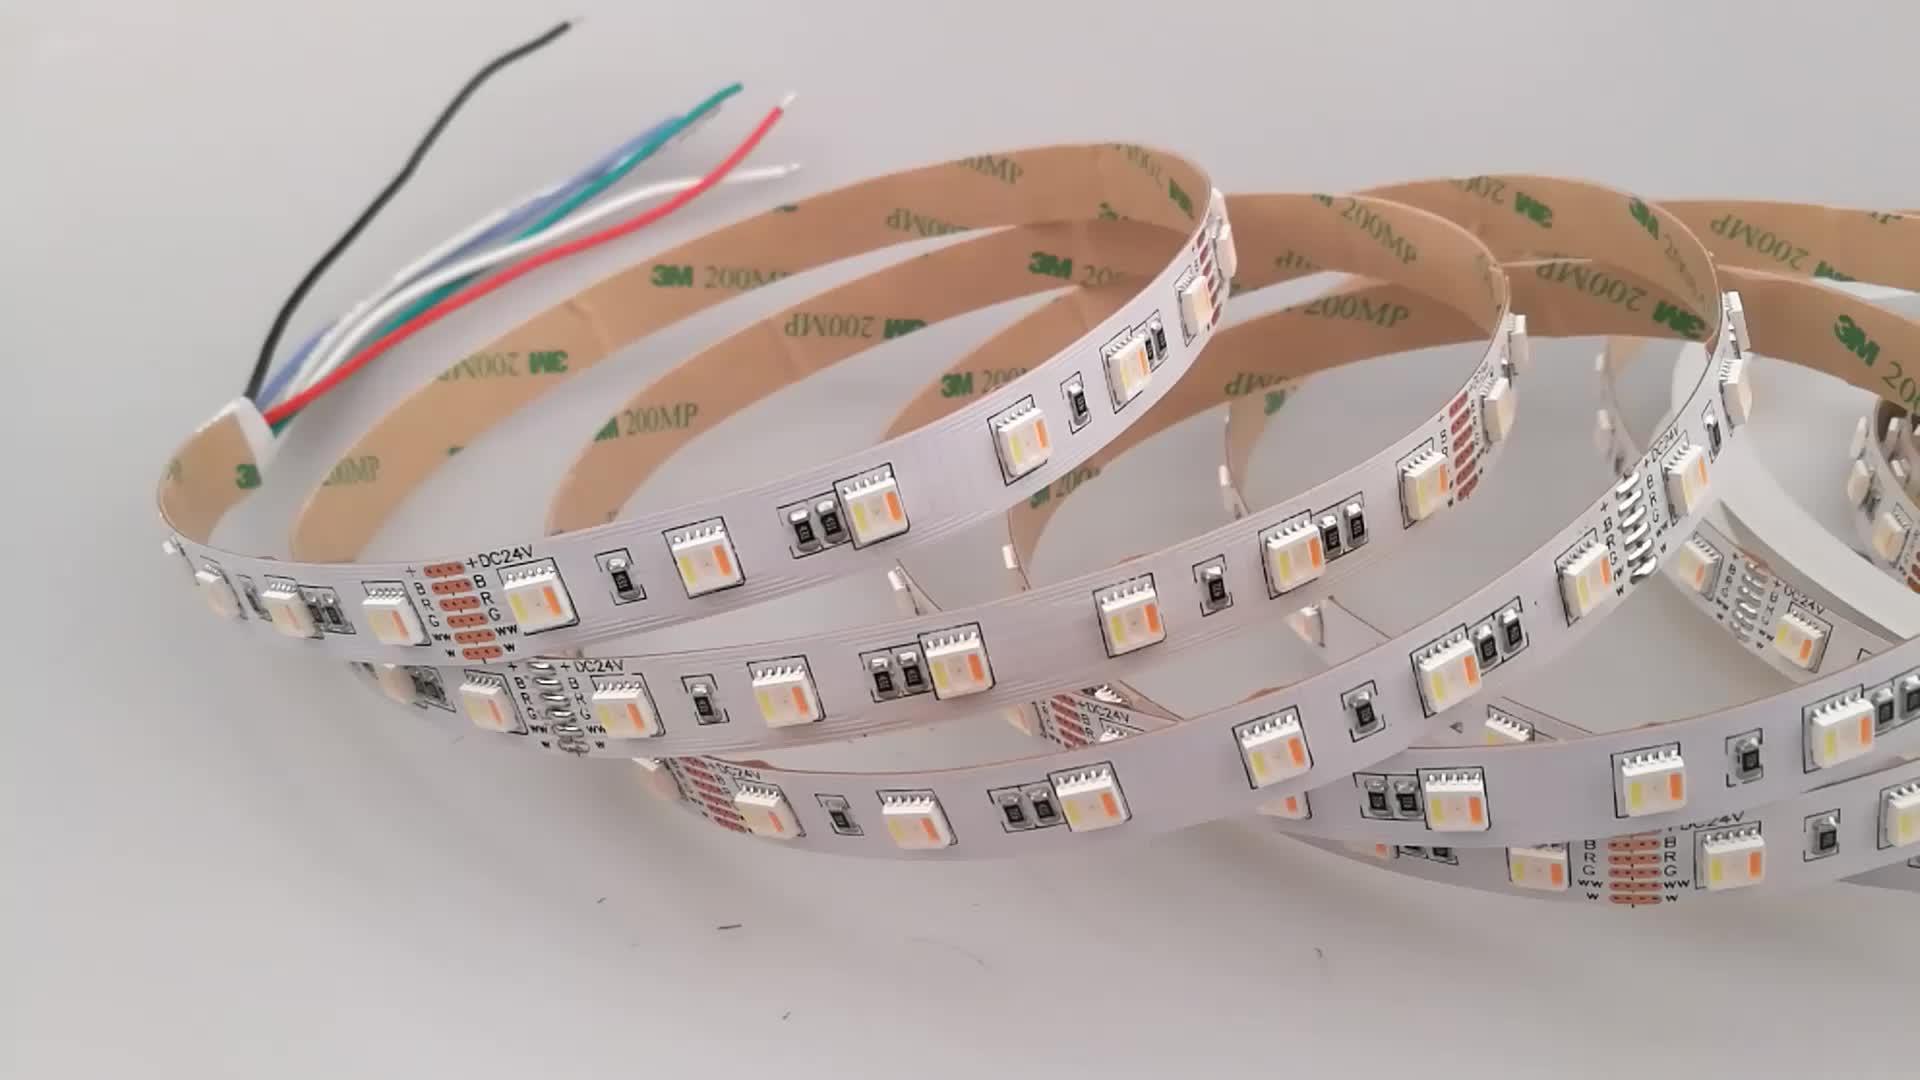 2019 hot sell GRILIGHT 12mm PCB 24W 5 color in 1 led multi color SMD5050 60led per meter RGBWW led strip